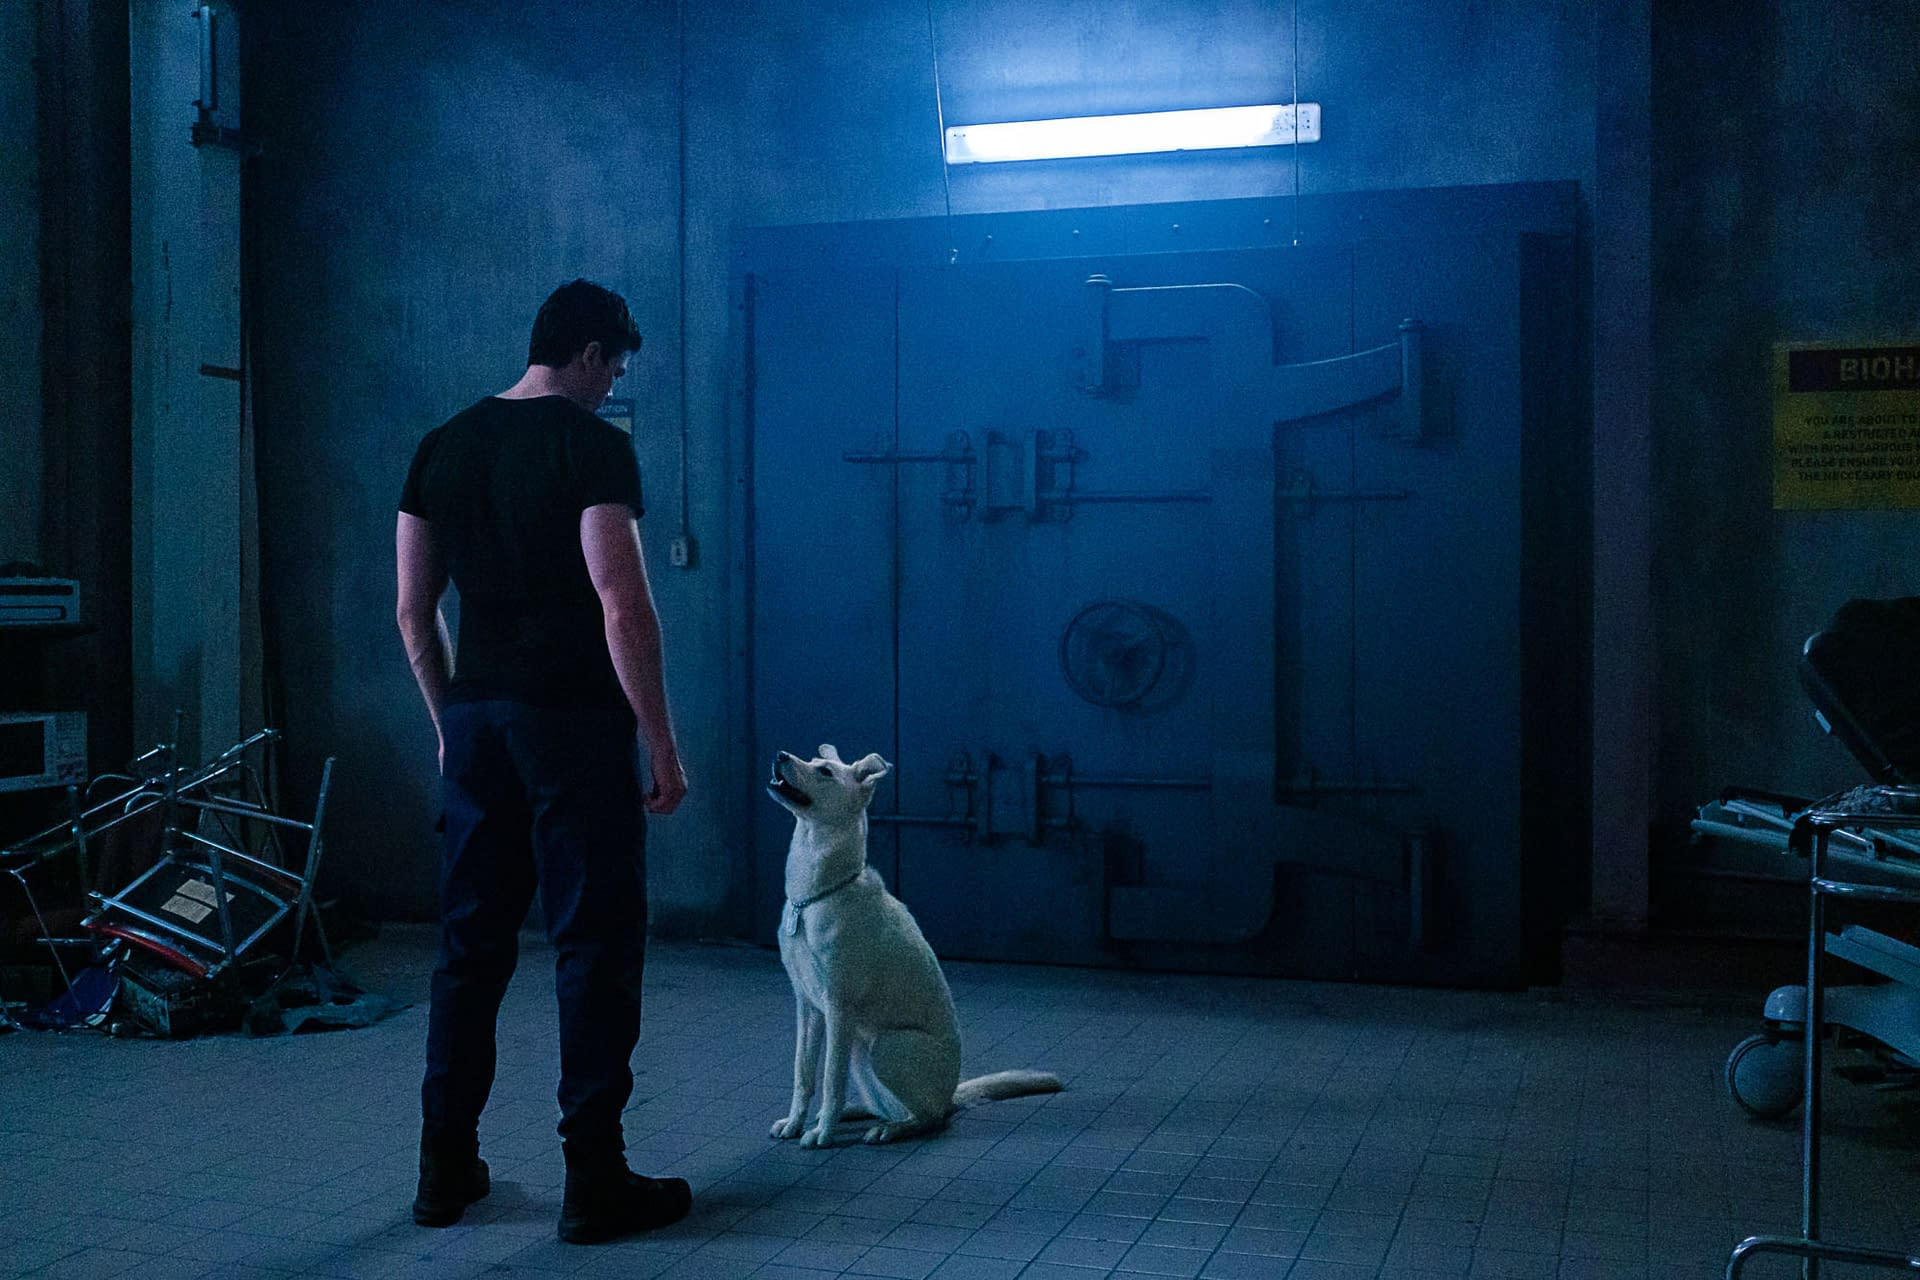 Titans Season 3 Star Joshua Orpin Introduces Series Newest Krypto © 2020 by yify movies. titans season 3 star joshua orpin